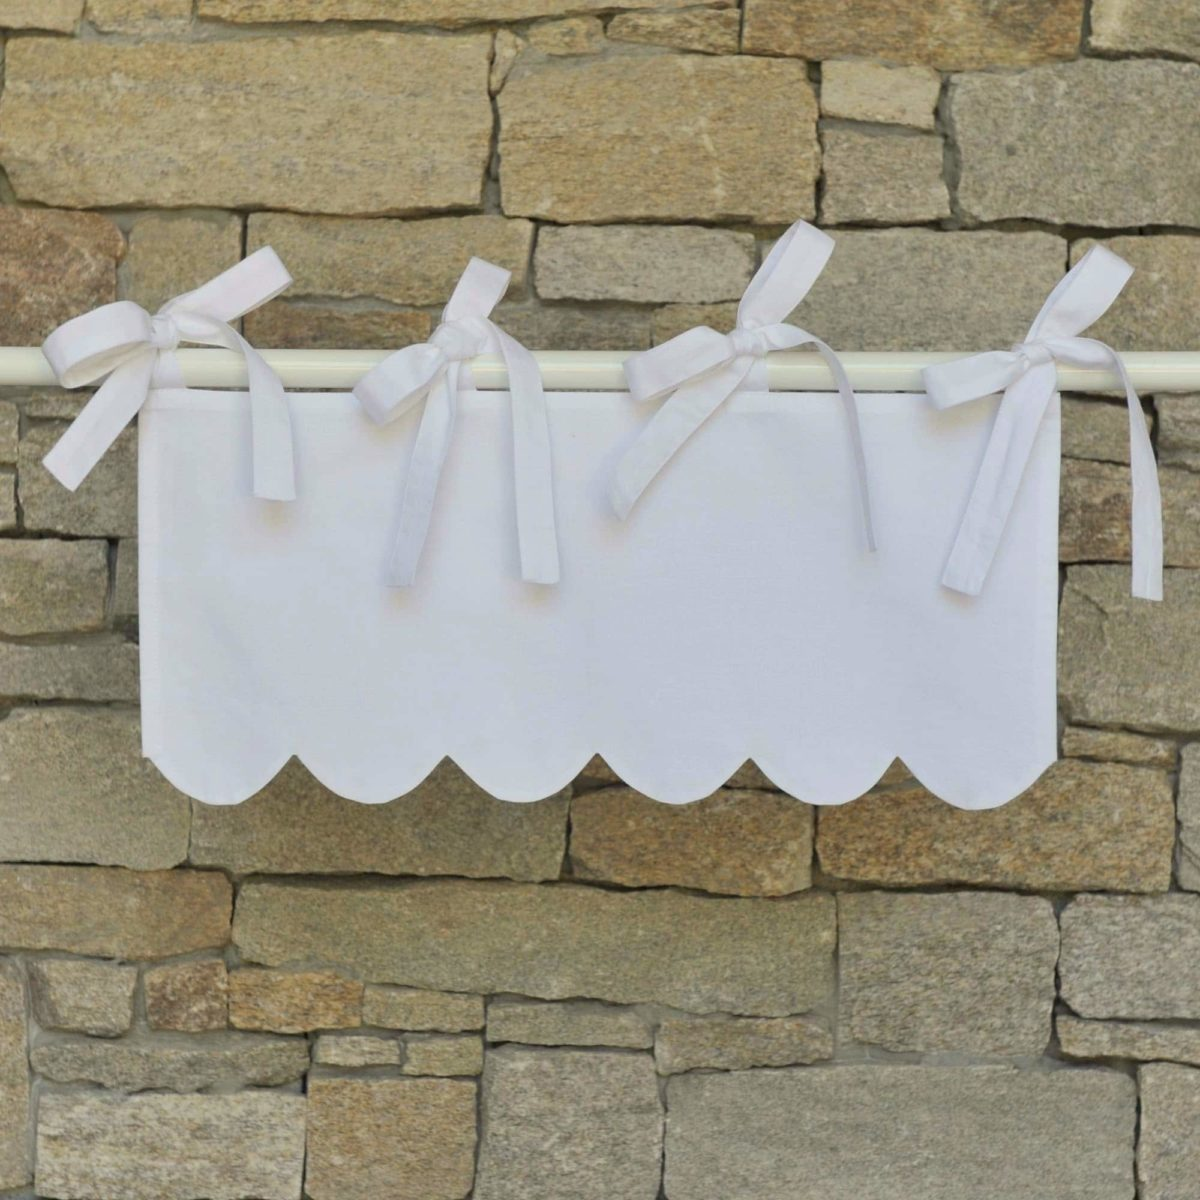 cantonniere blanche modele campagne